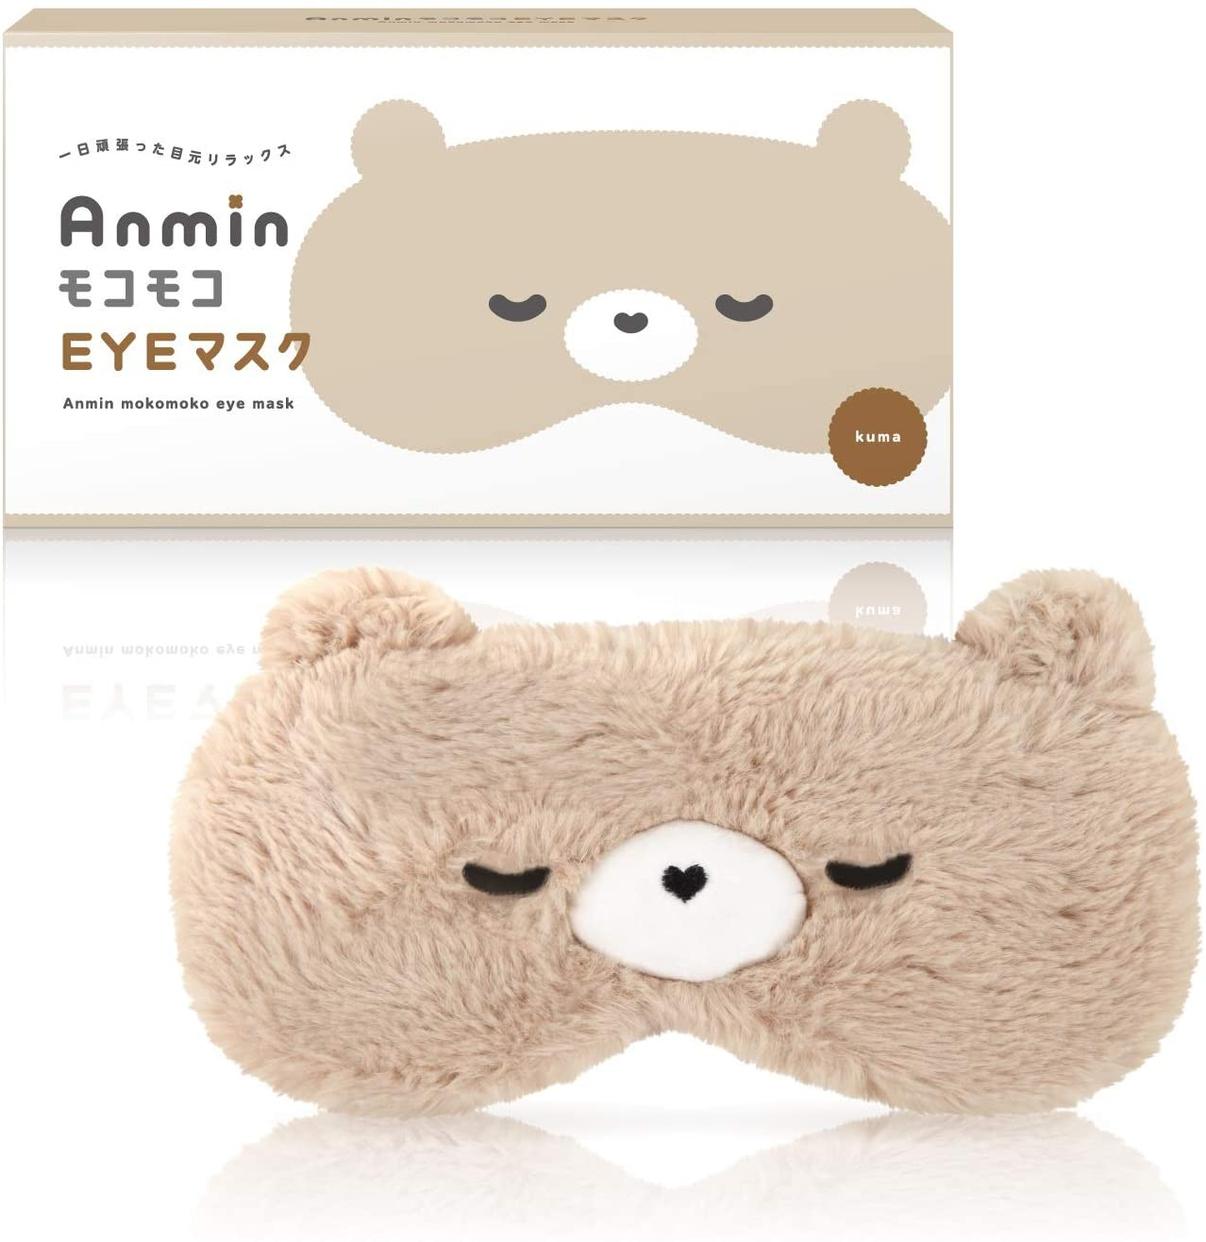 Anmin(アンミン) モコモコ ホットアイマスクの商品画像